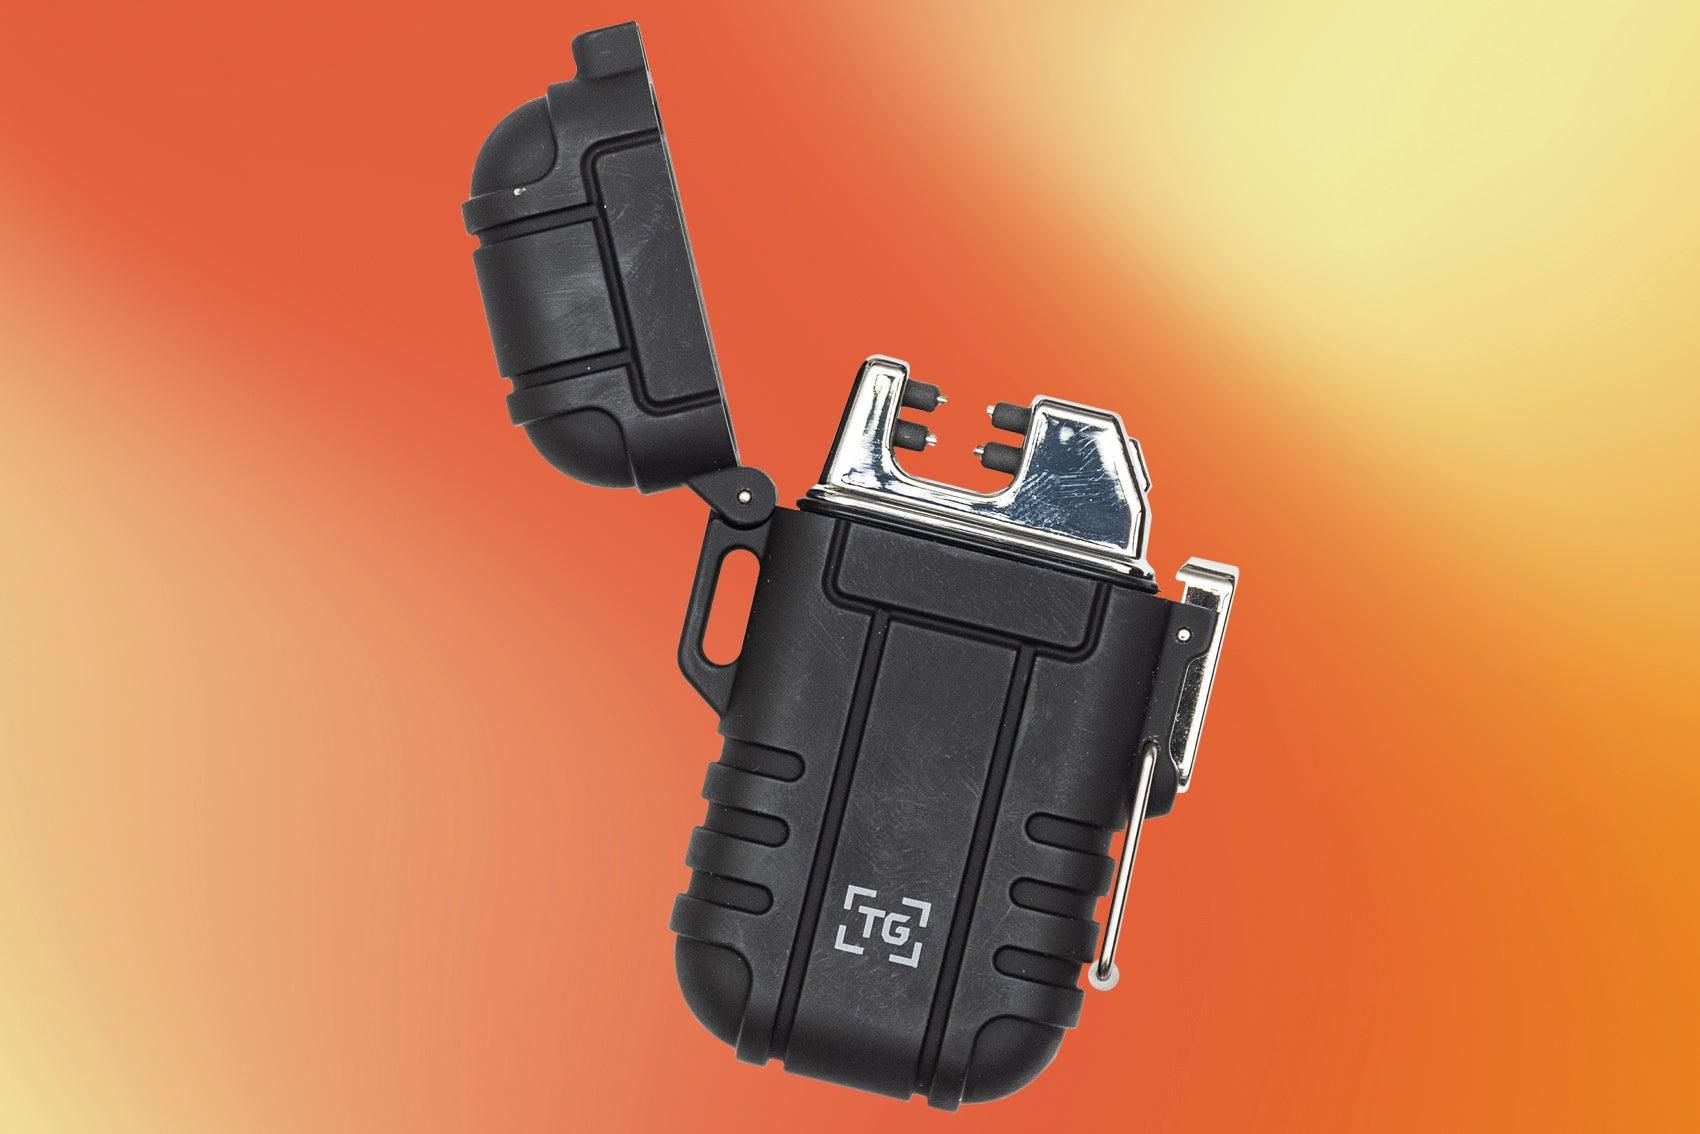 TGP Plasma lighter